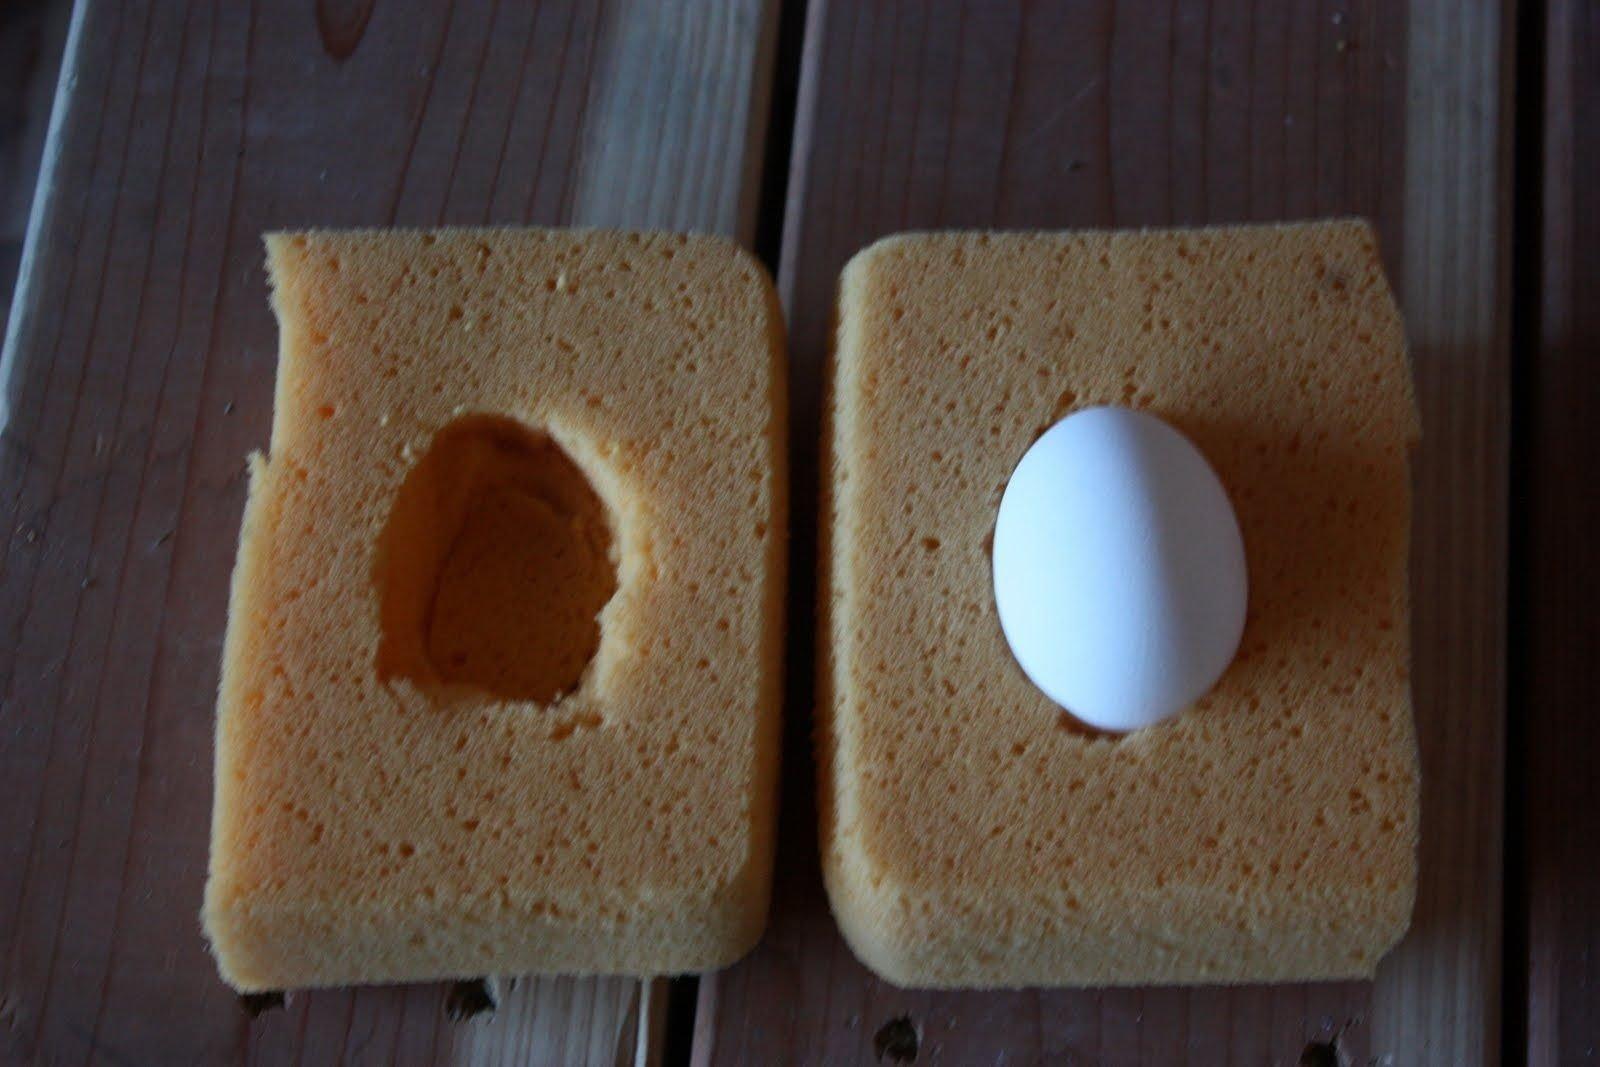 10 Most Popular Egg Drop Ideas That Work egg drop designs google search crafts pinterest egg drop 6 2021